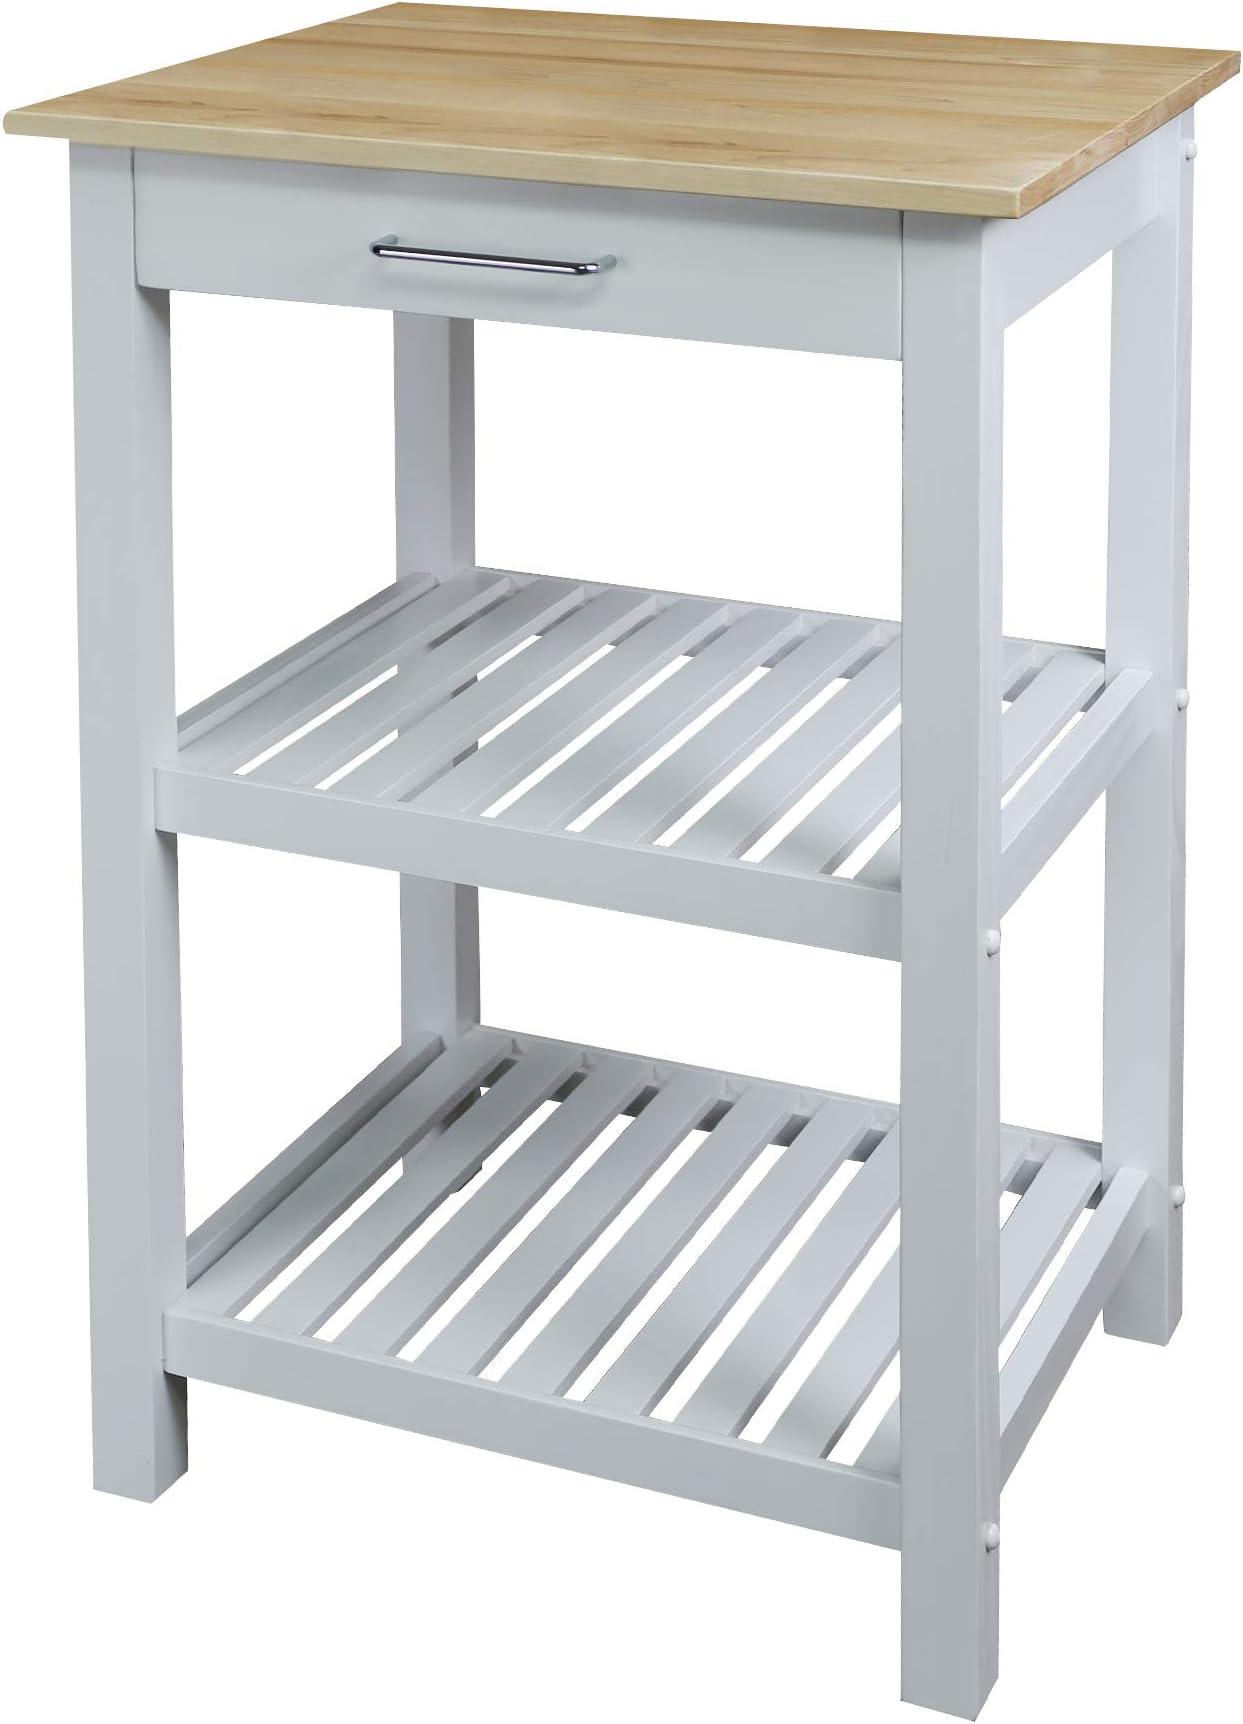 kitchen islands carts amazon com rh amazon com kitchen table cartoon kitchen cart table leaf